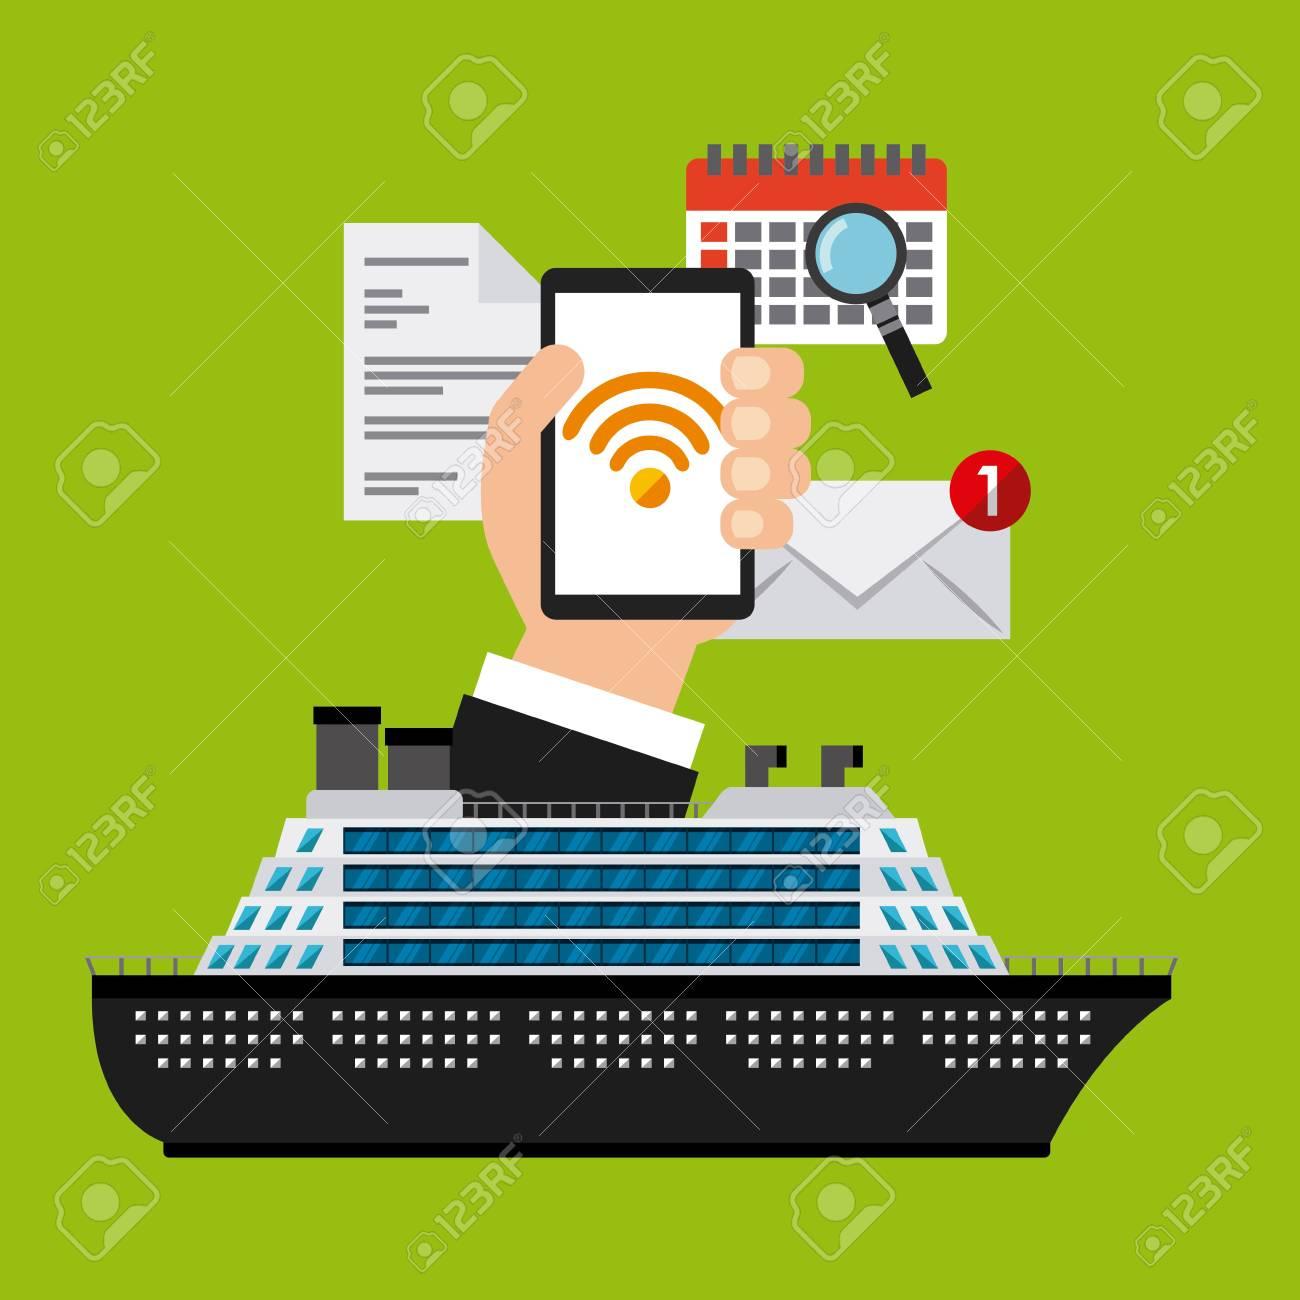 free wifi on board design, vector illustration eps10 graphic